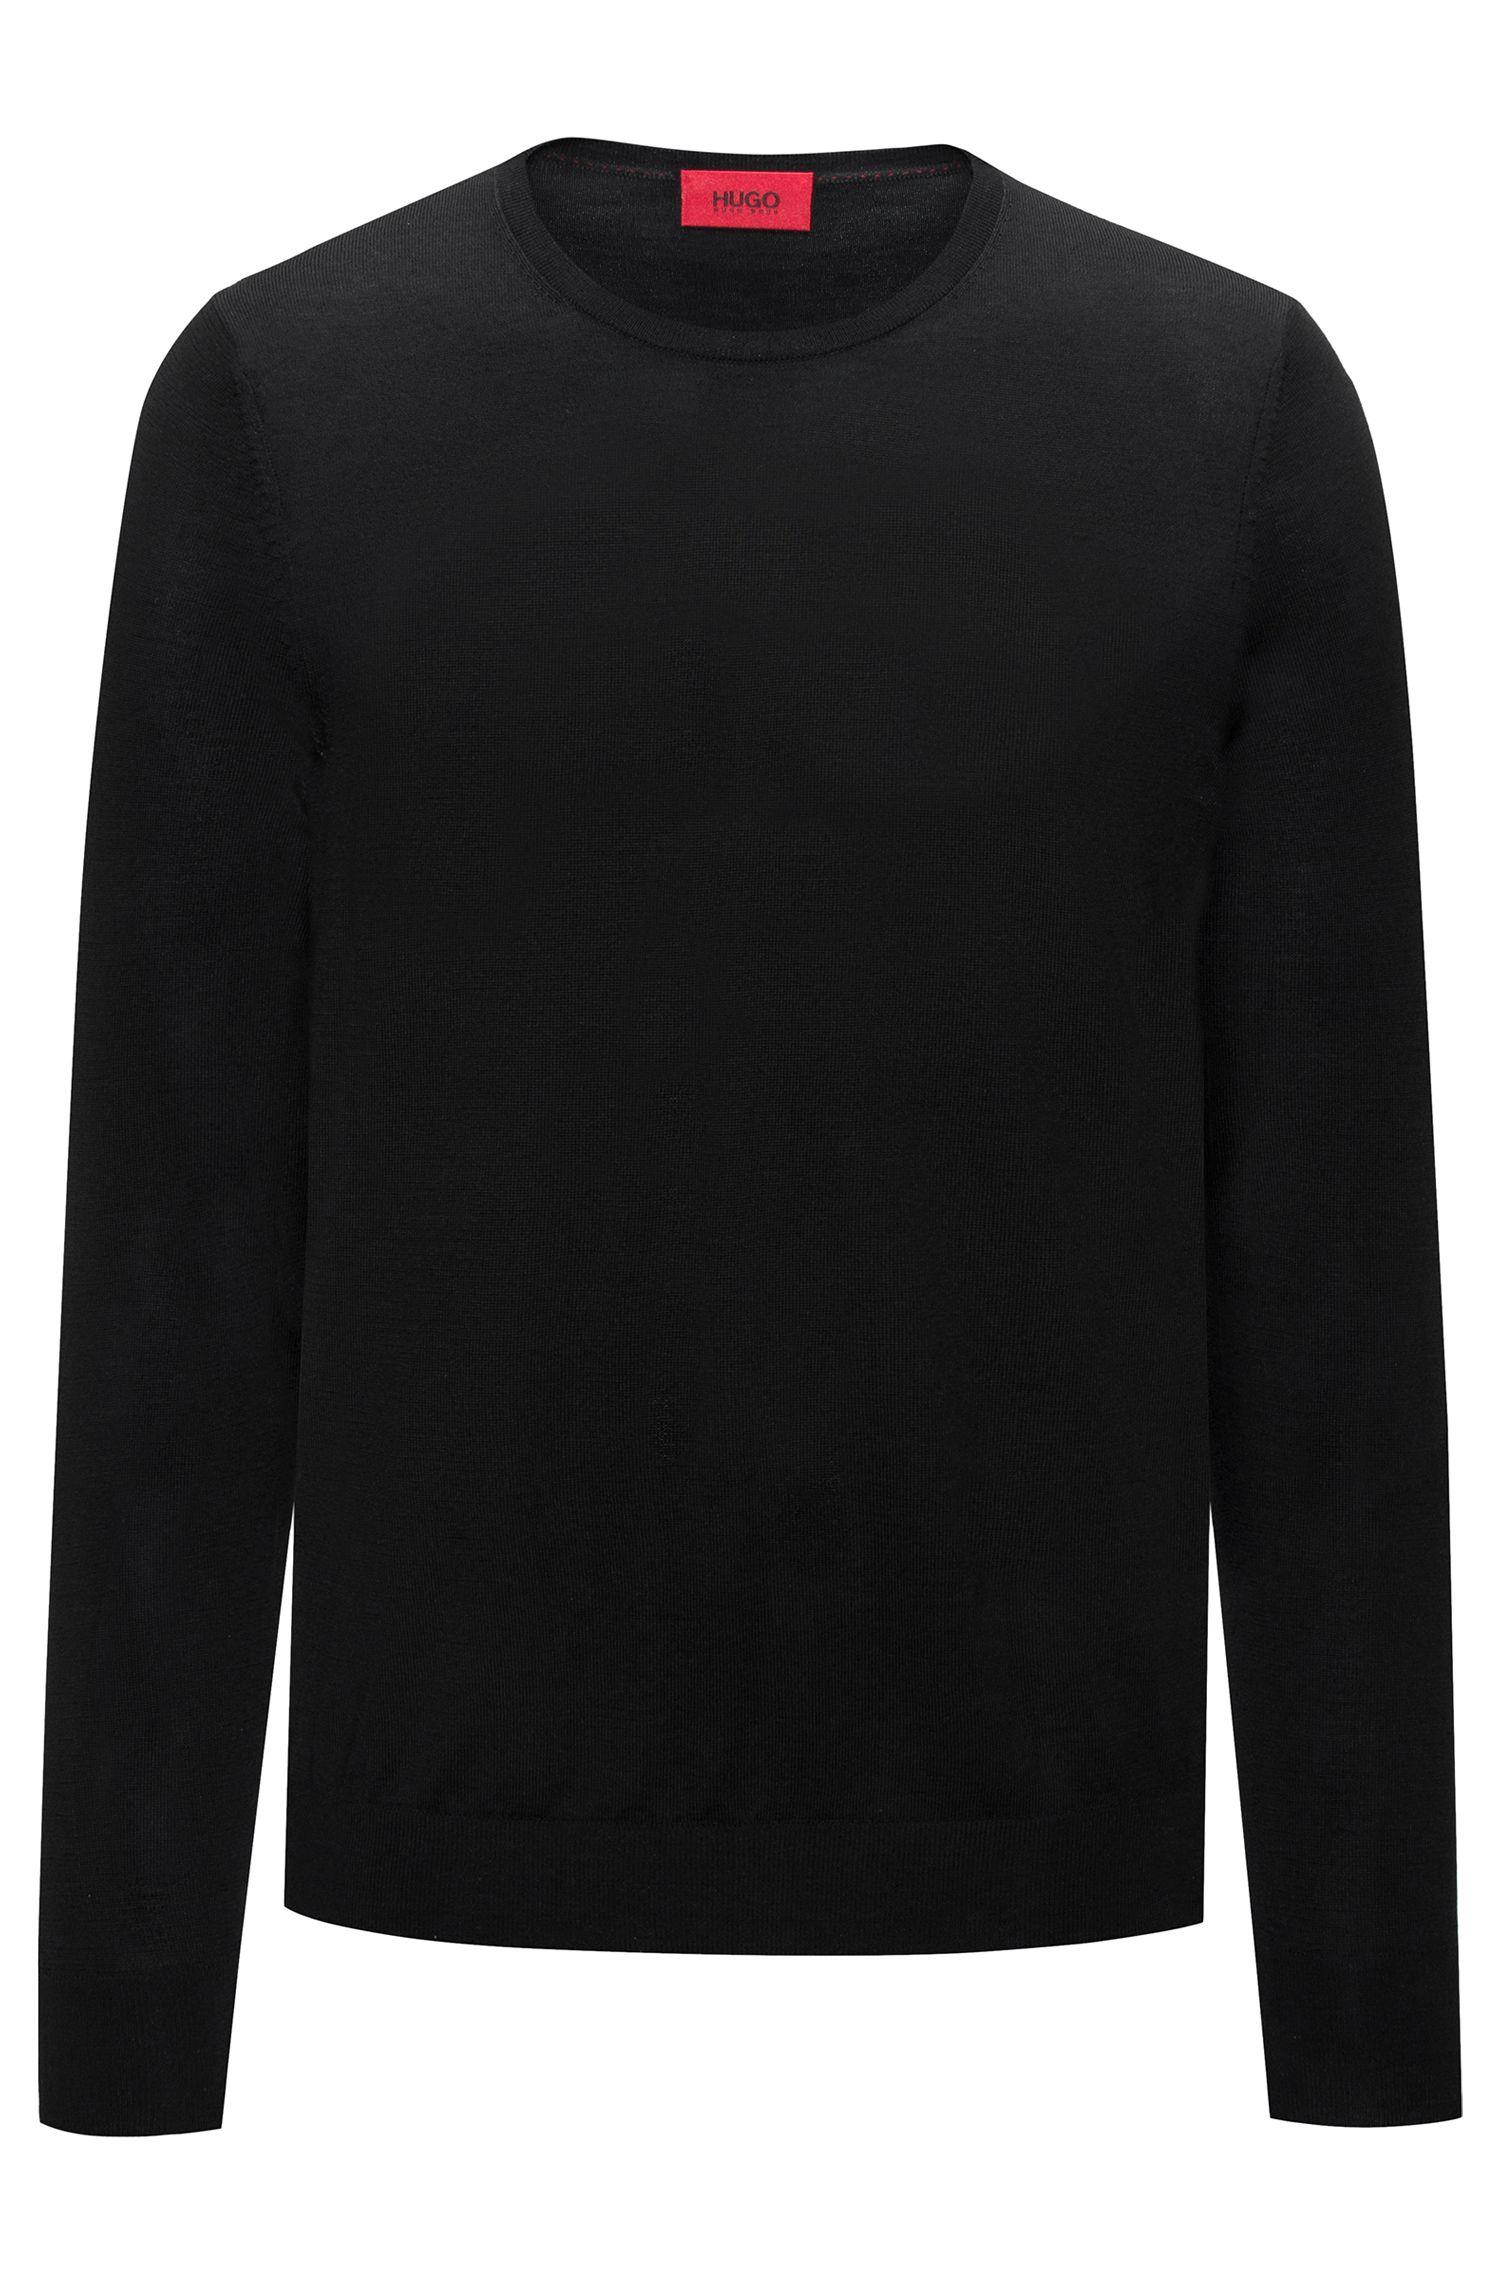 Crew-neck sweater in a lightweight merino wool blend